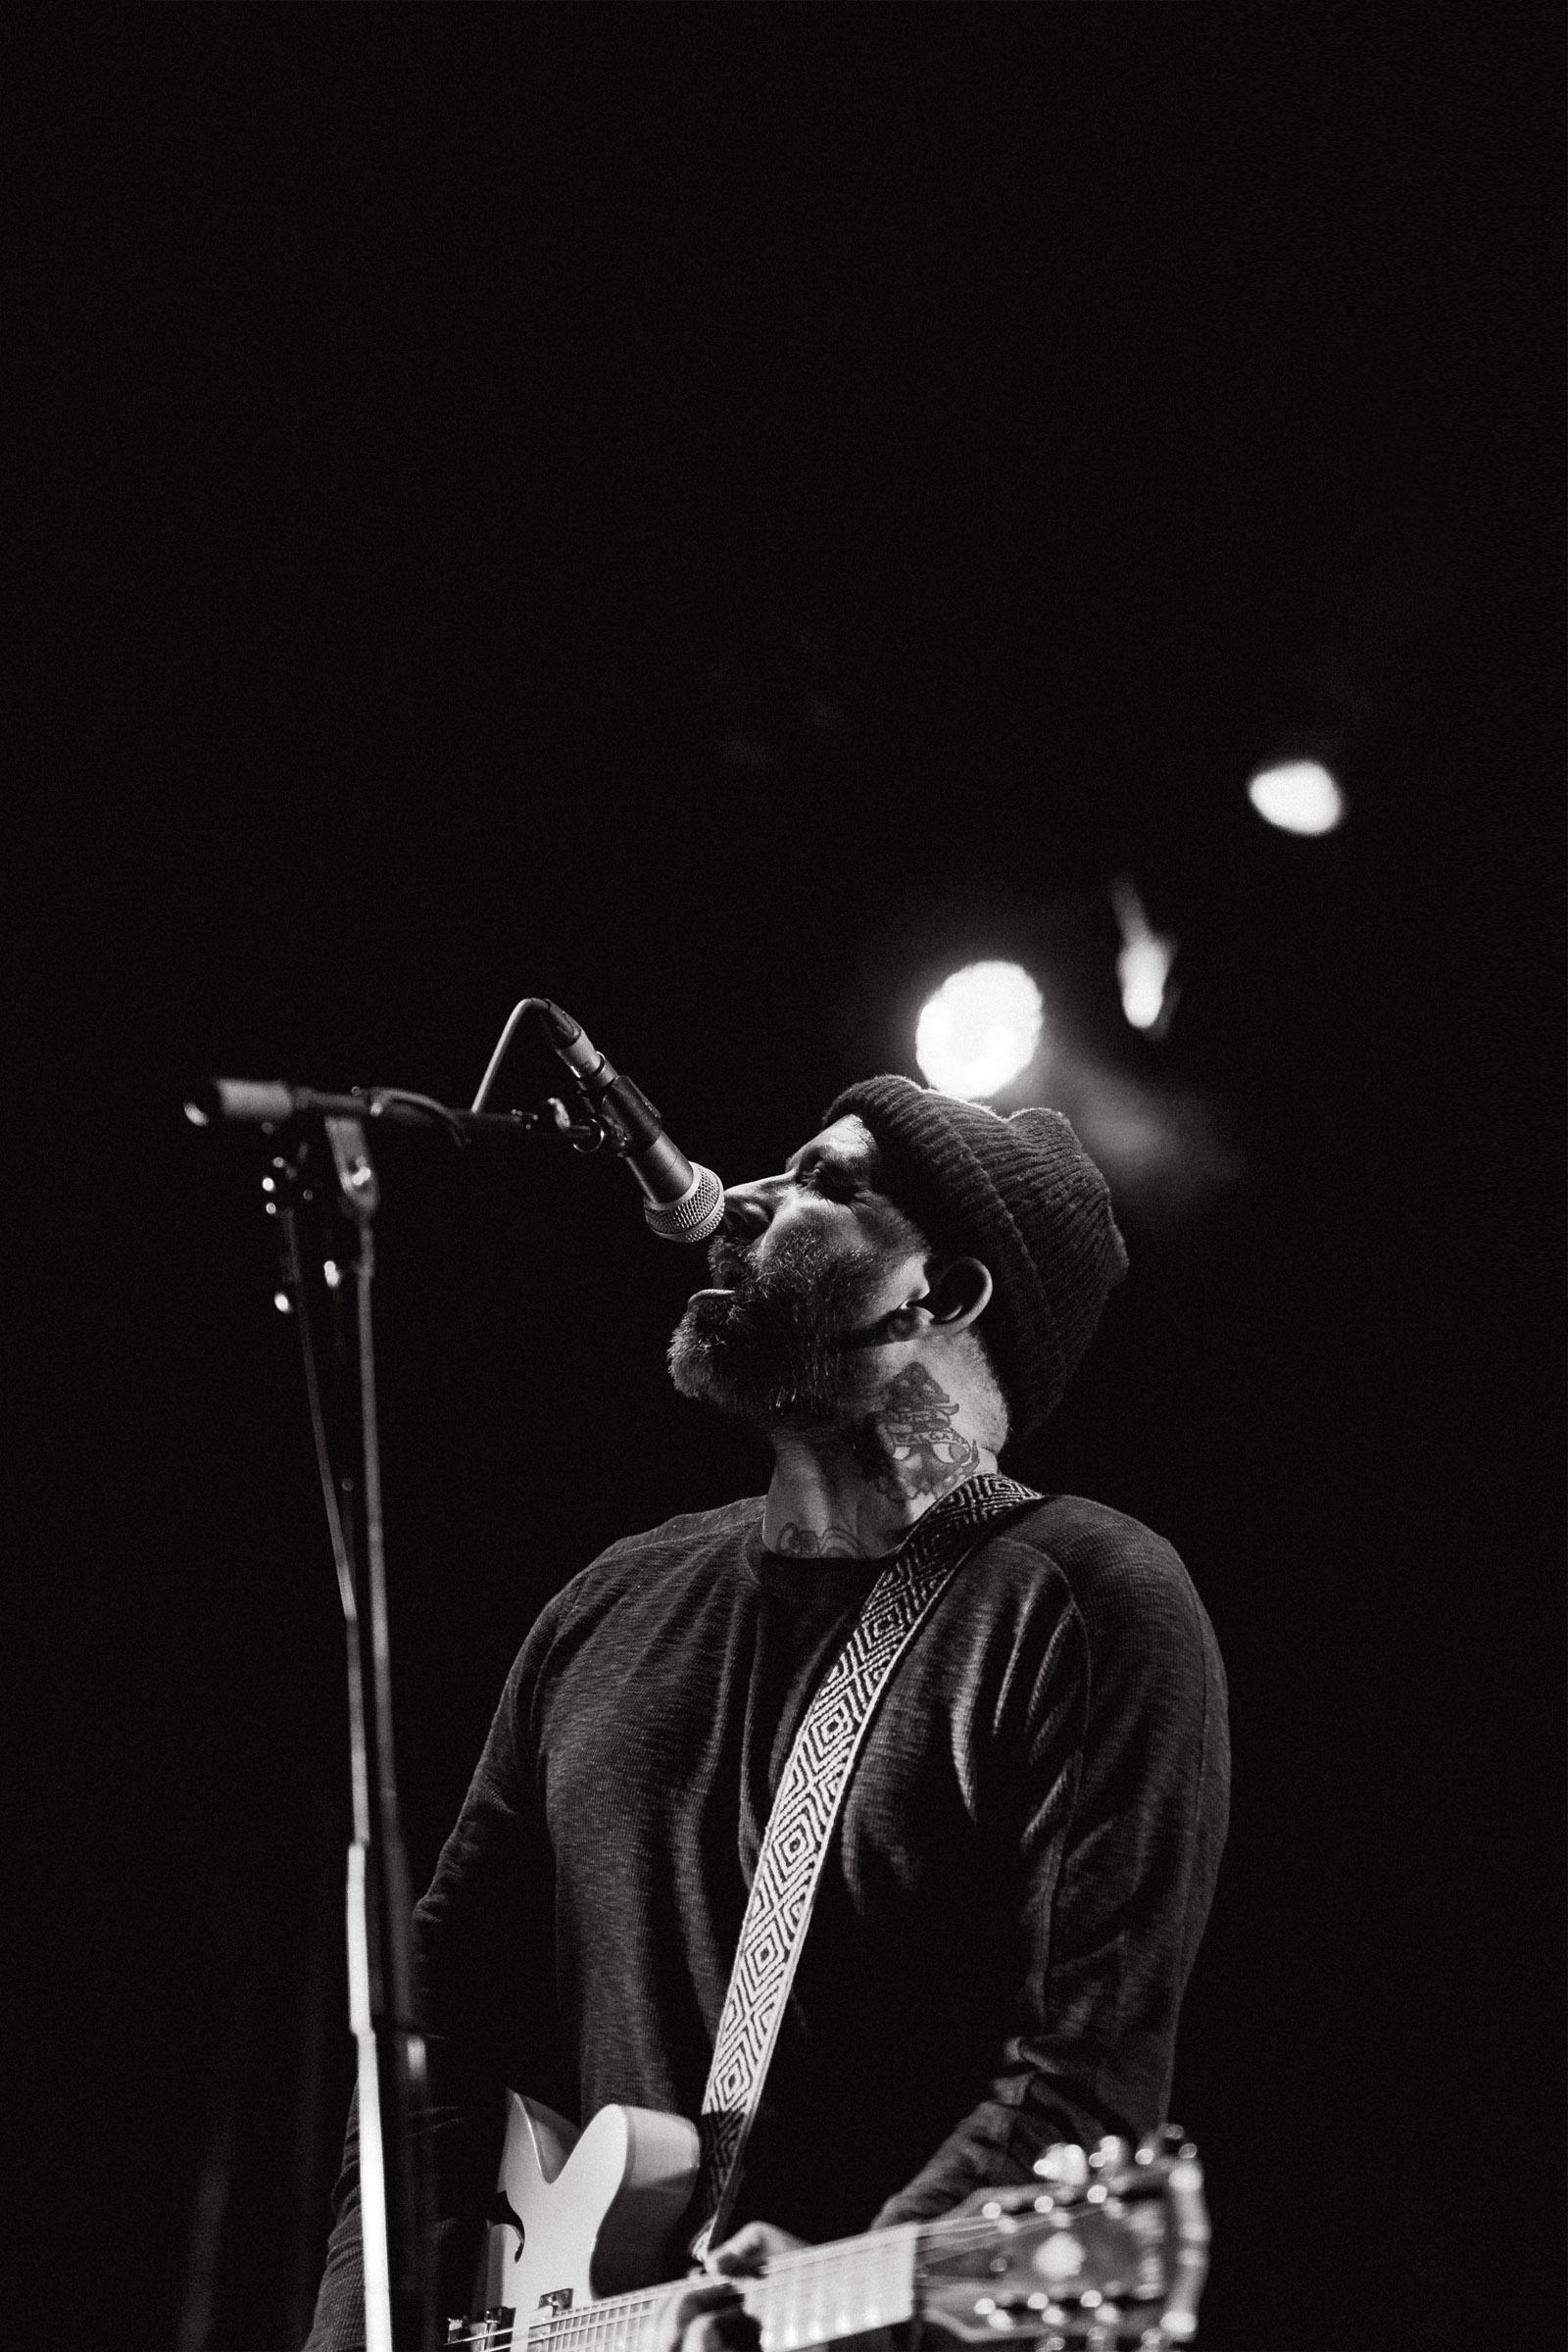 Dallas Green - Alexisonfire